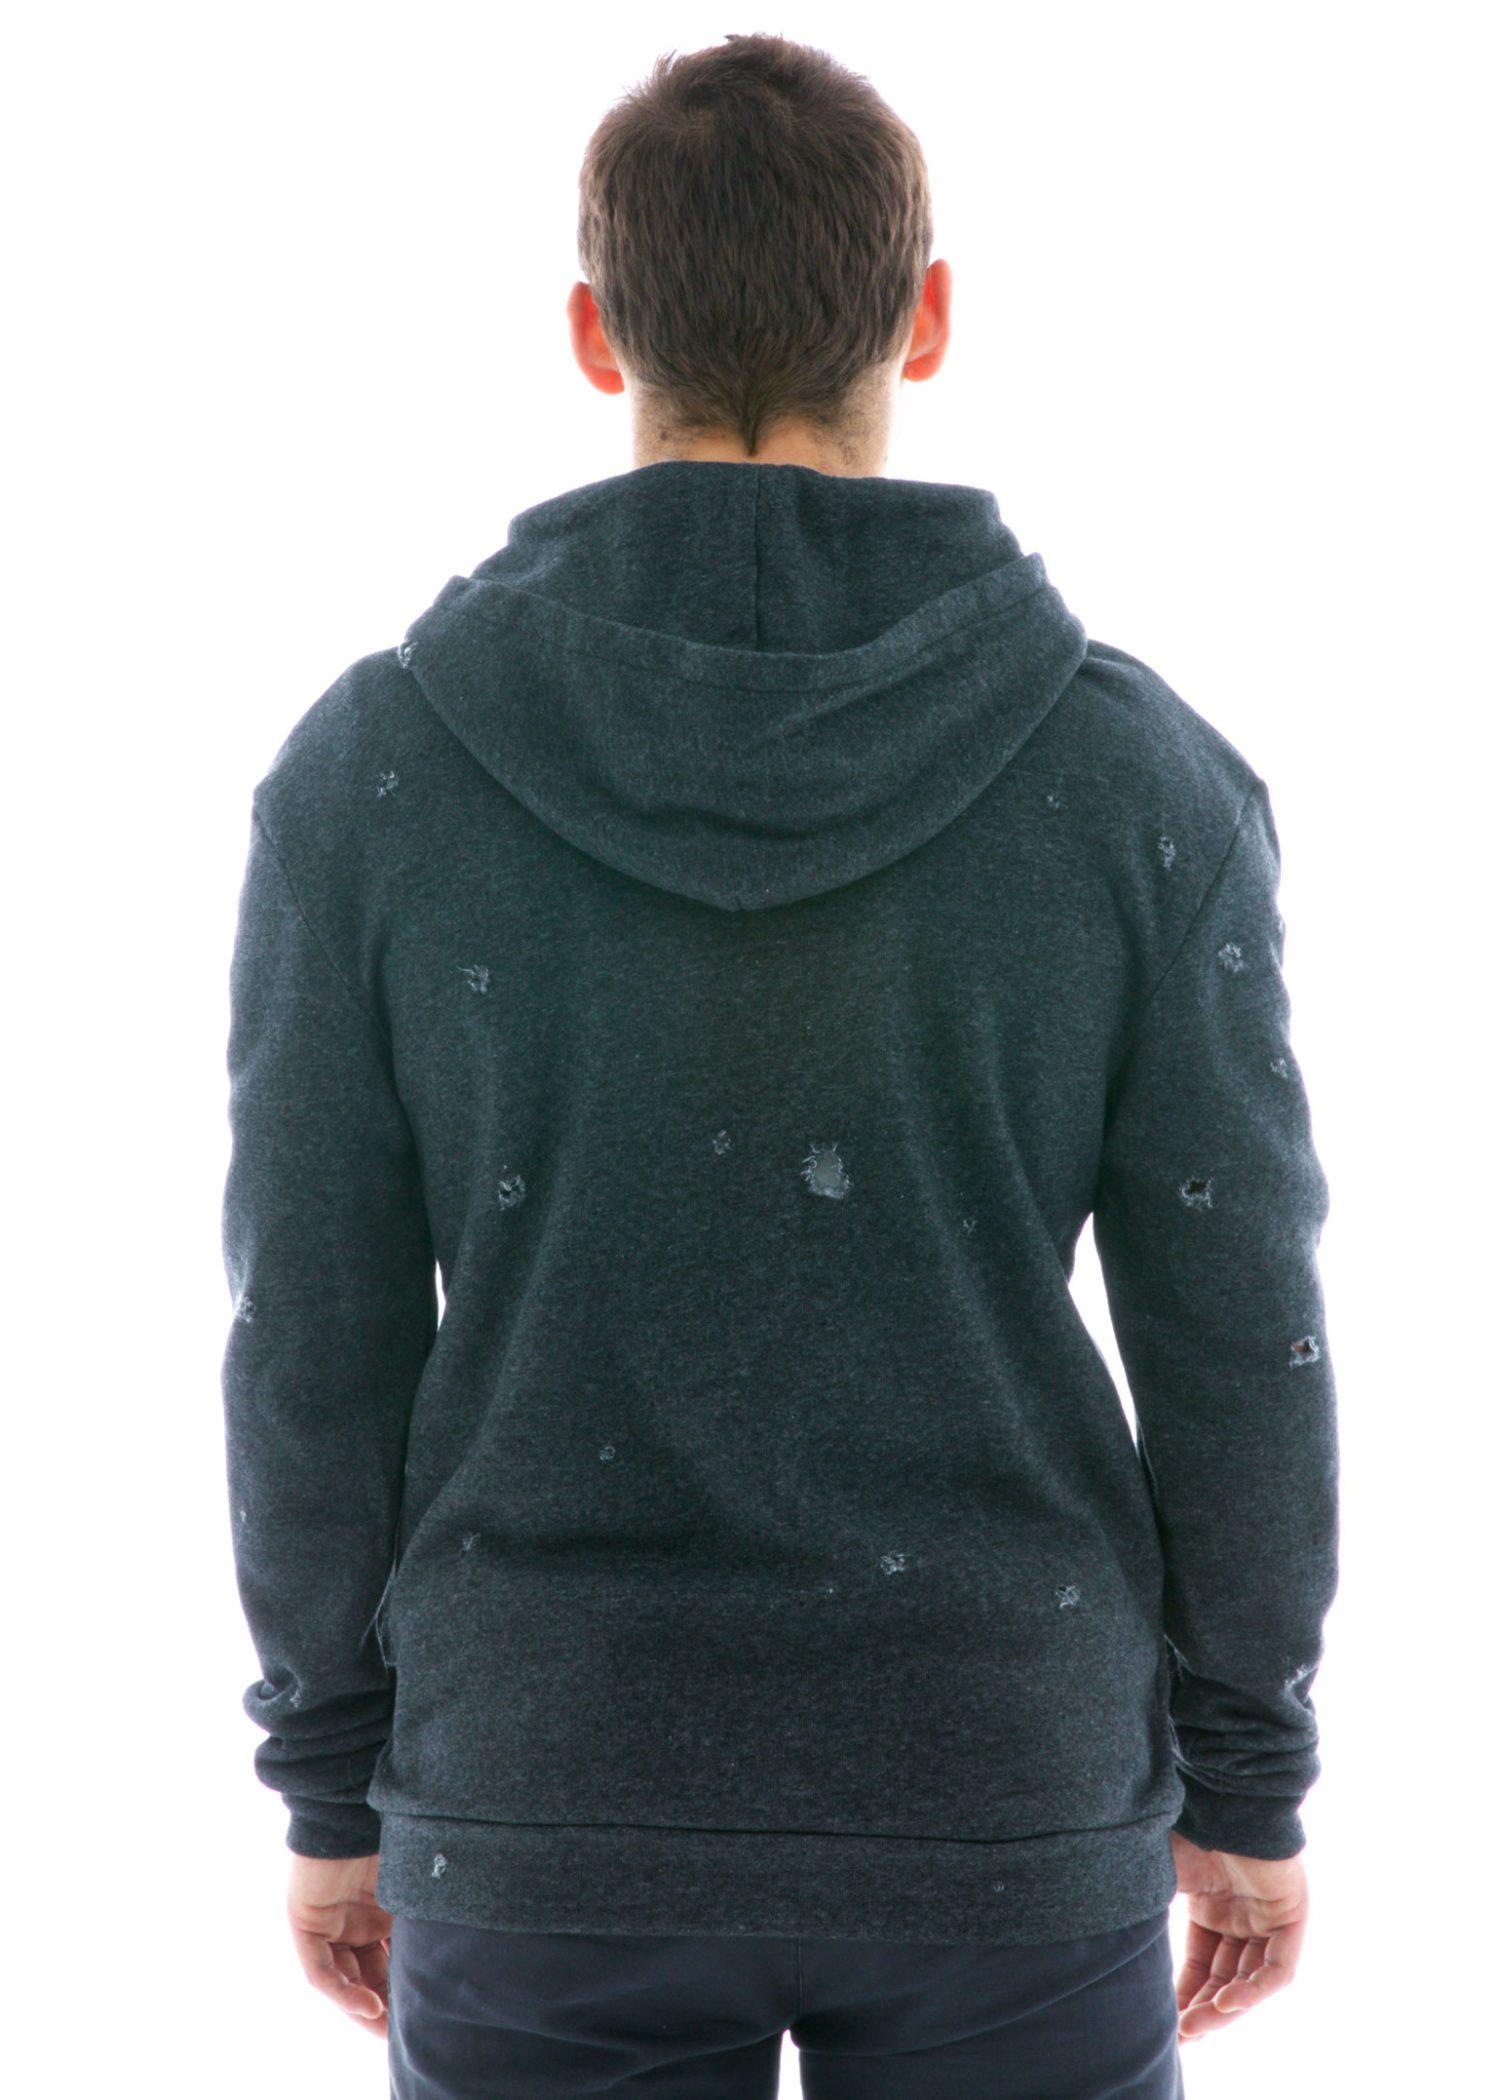 Unisex Destroyed Pullover Hoodie